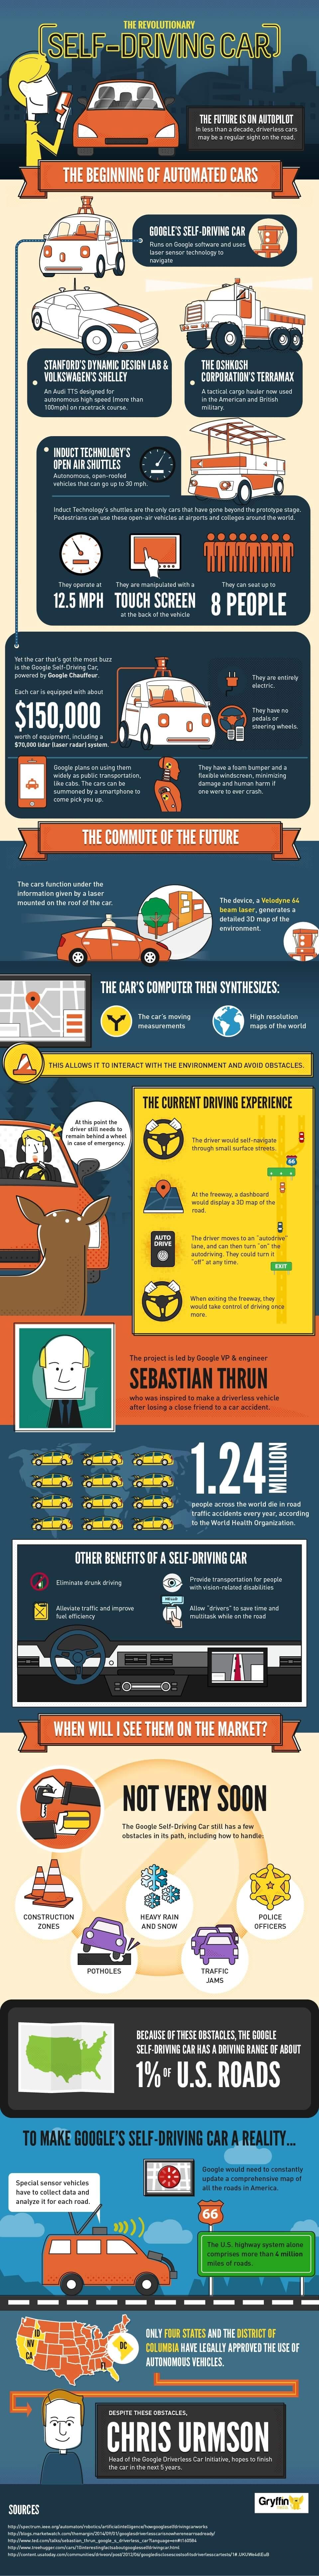 The Revolutionary Self-Driving Car